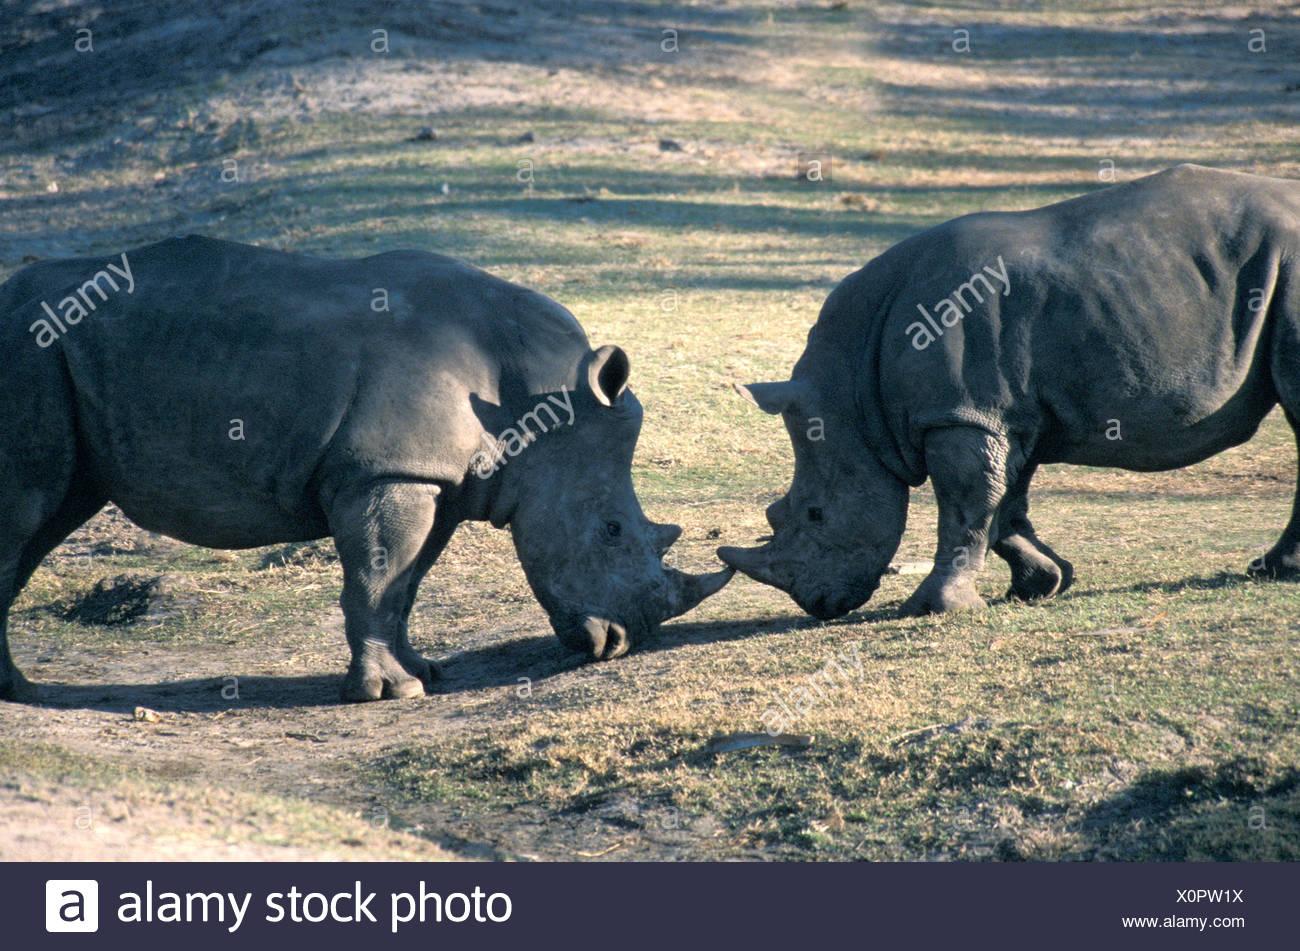 Animal Animals Battle Battles square-lipped rhinoceros Ceratotherium simum Duel Dueling Duels Fight rhinoc - Stock Image